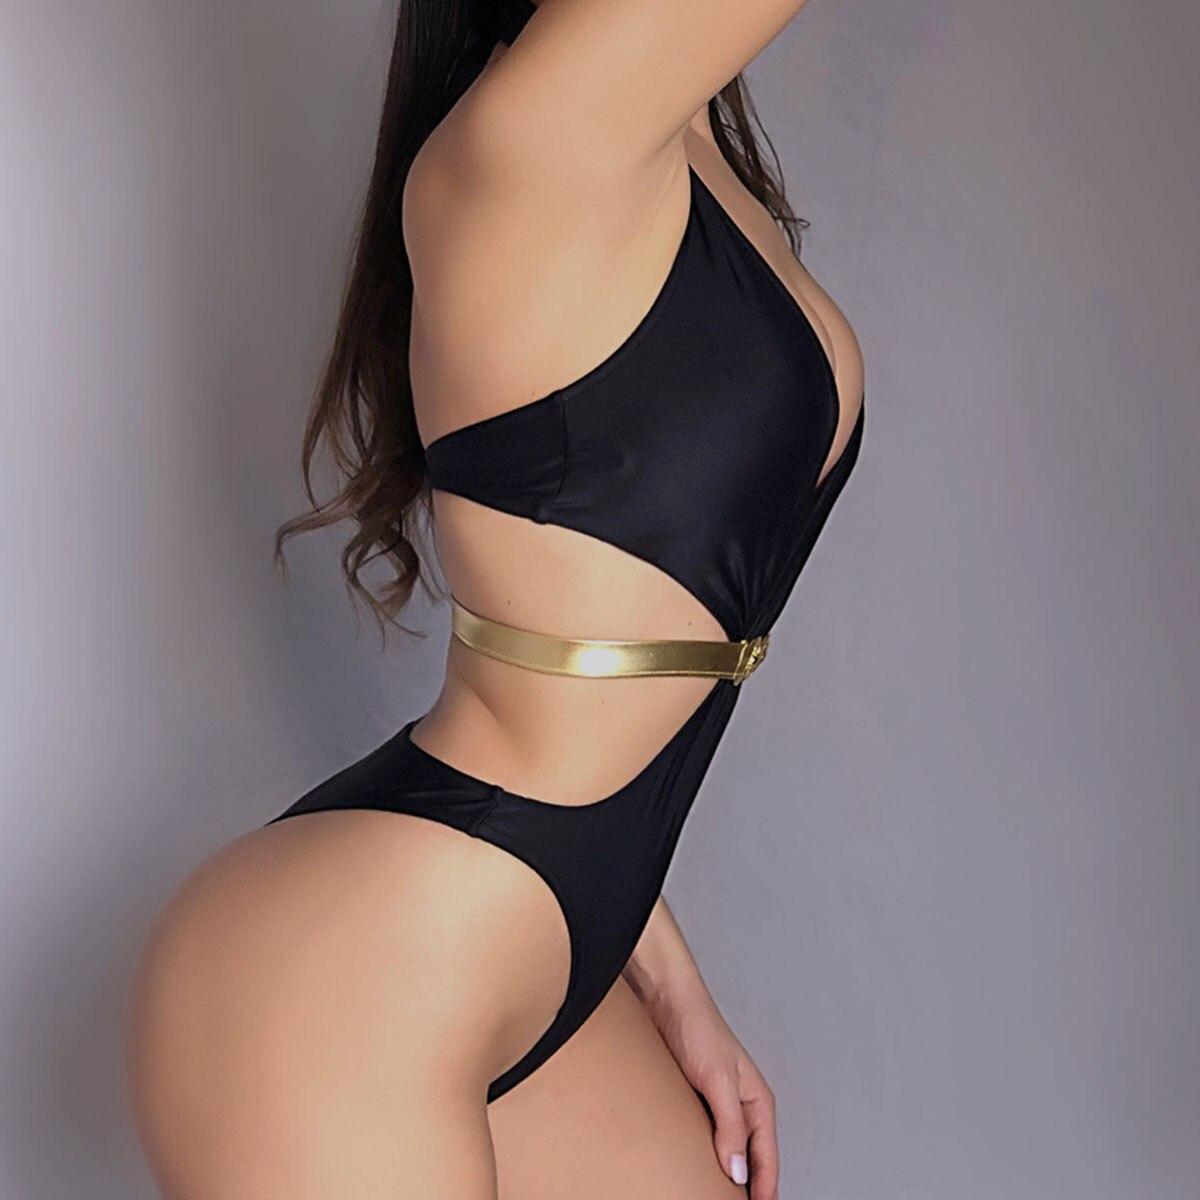 ÇFree ShipOne-Piece Swimsuit Monokini Backless Sexy High-Cut Brazilian Women Glod